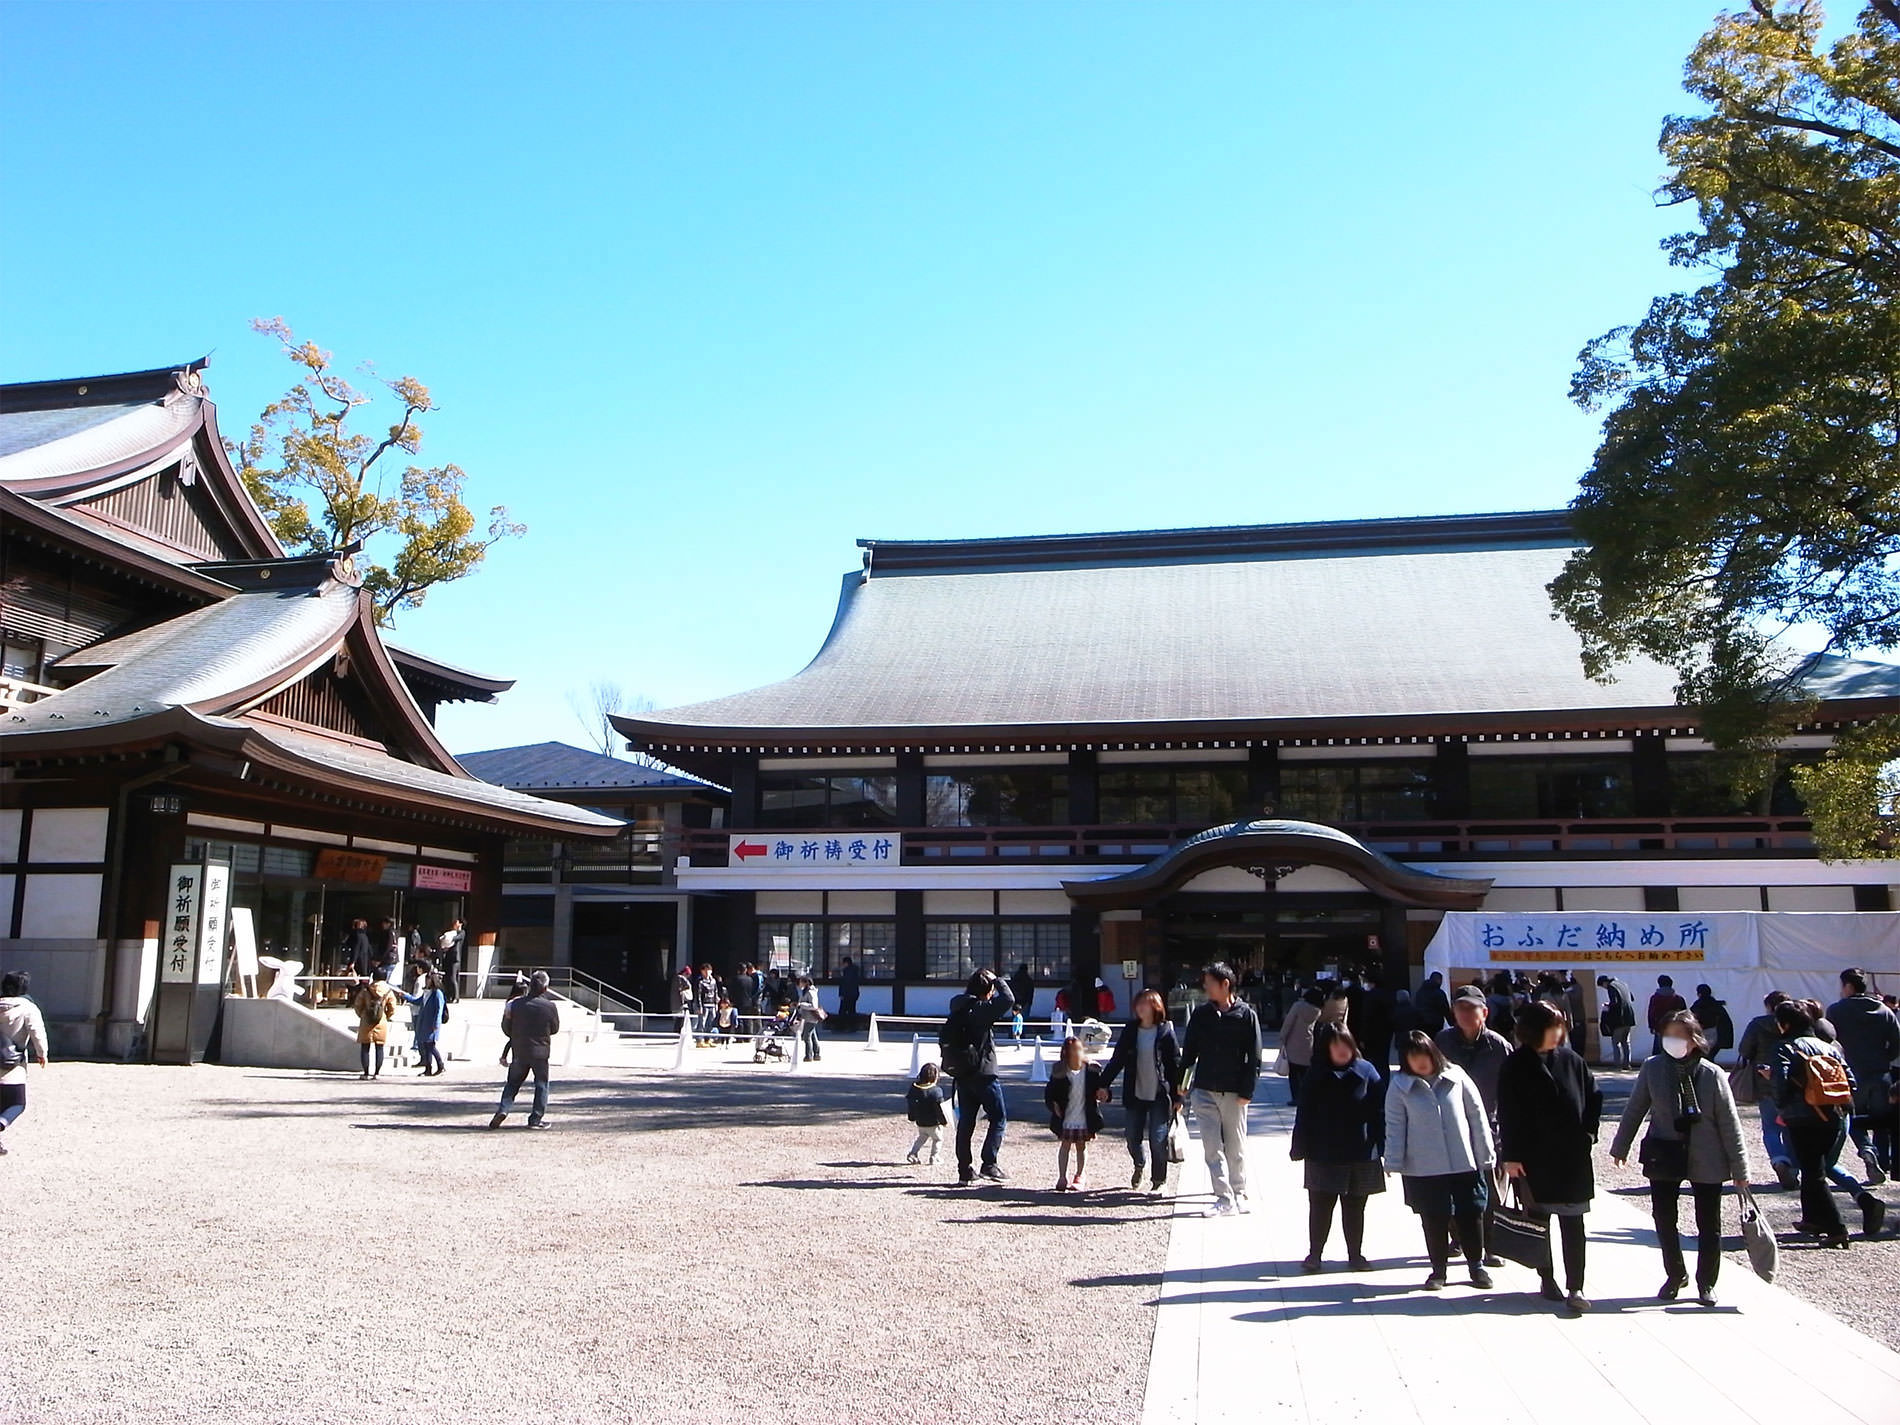 寒川神社 / 2017 | Samukawa shrine in 2017